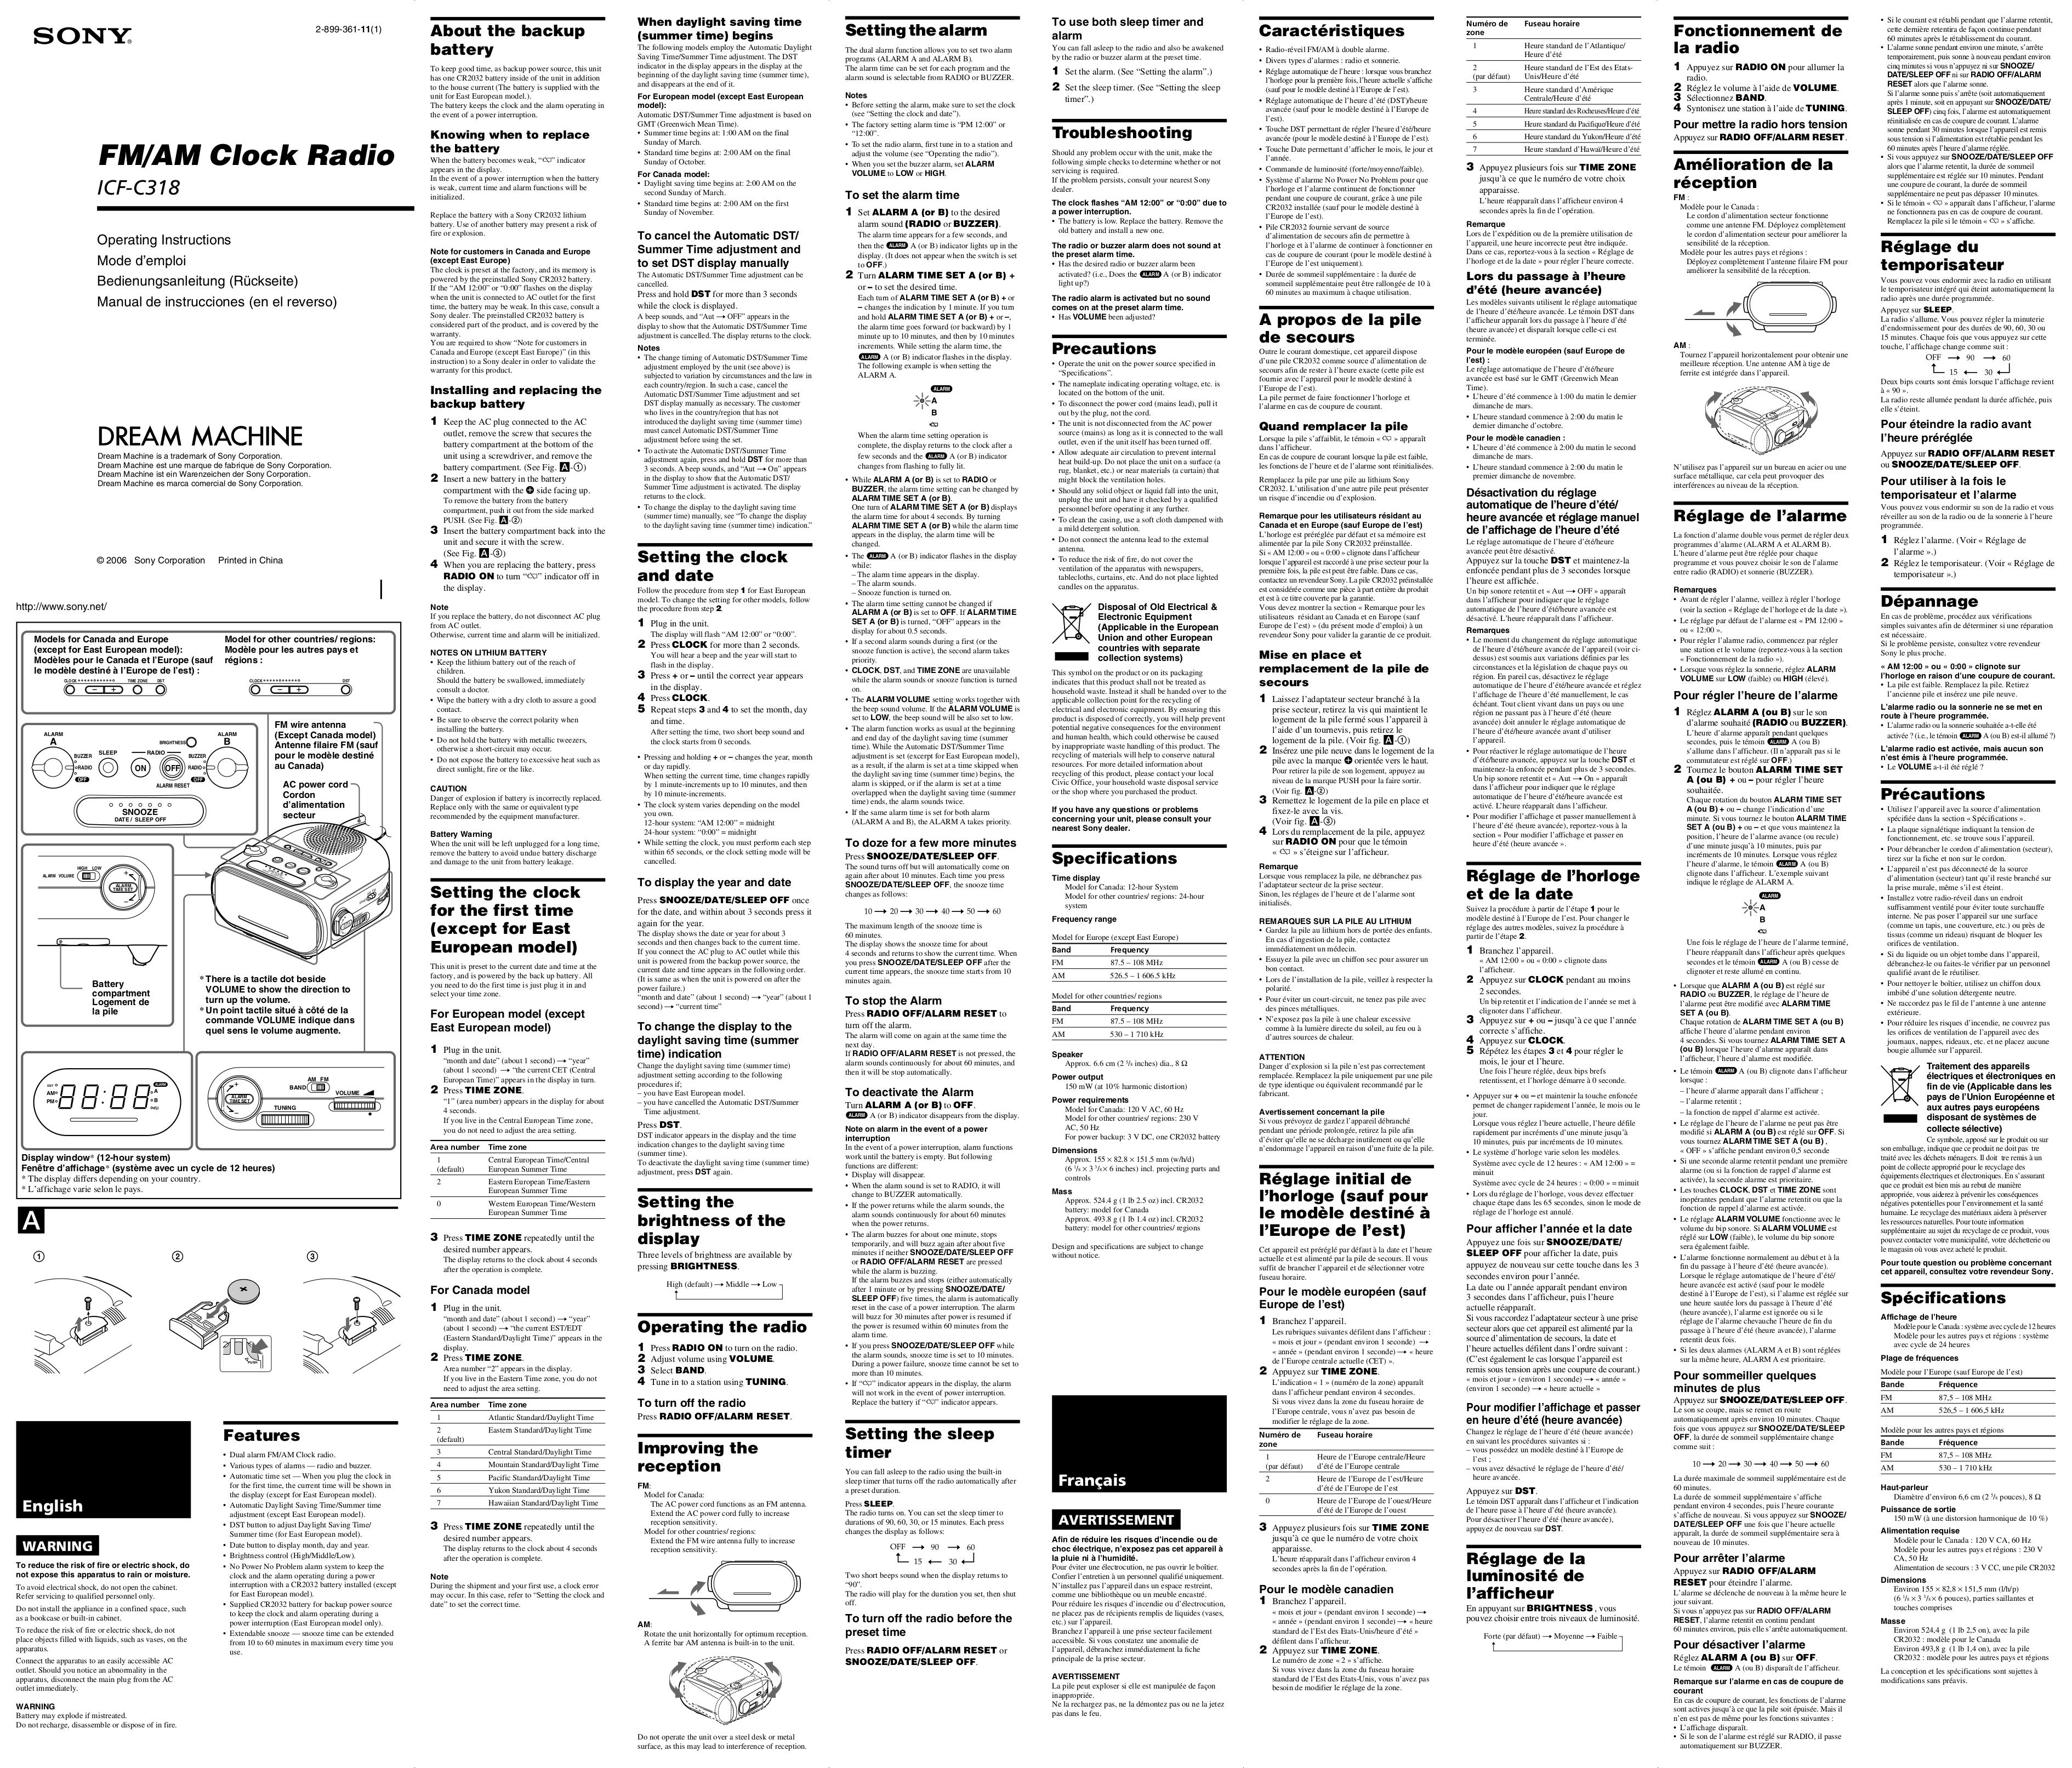 download free pdf for sony icf c318 clock radio manual rh umlib com Sony Alarm Clock Sony Dream Machine Clock Radio Manual